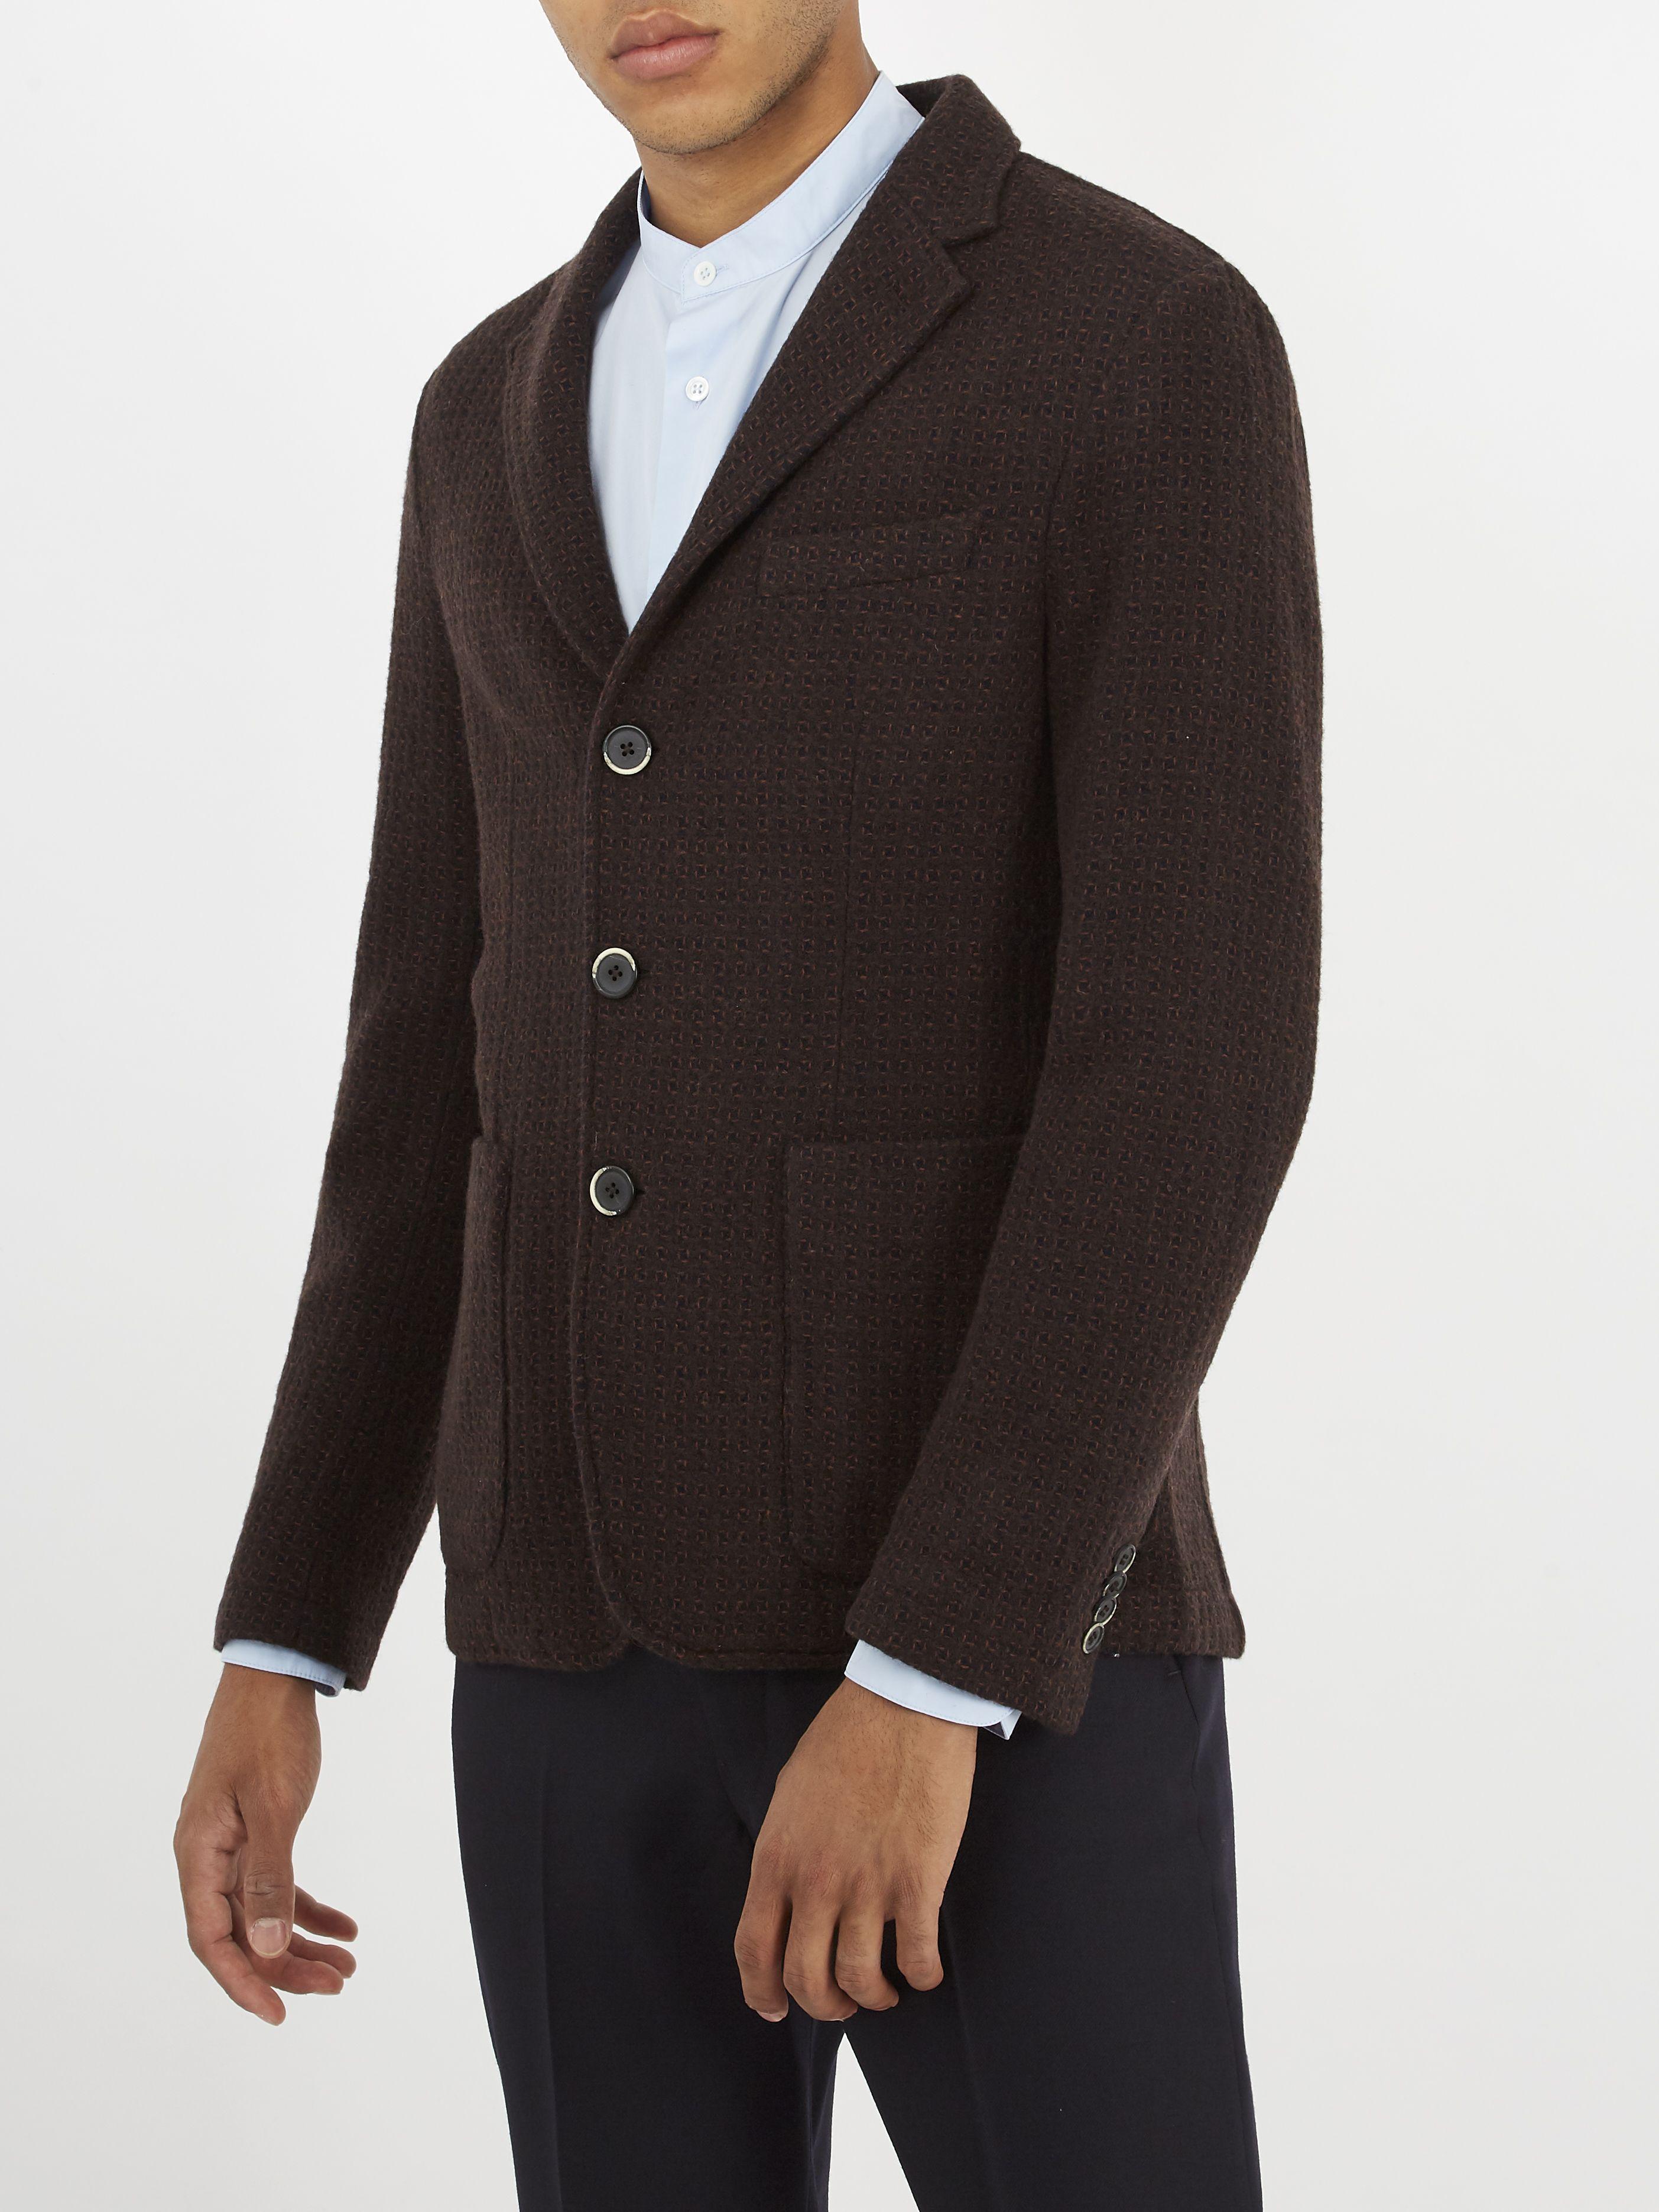 Barena Mens Wool-Blend Jacquard Two-Button Jacket Shop For Cheap Online IXQNshVtHB